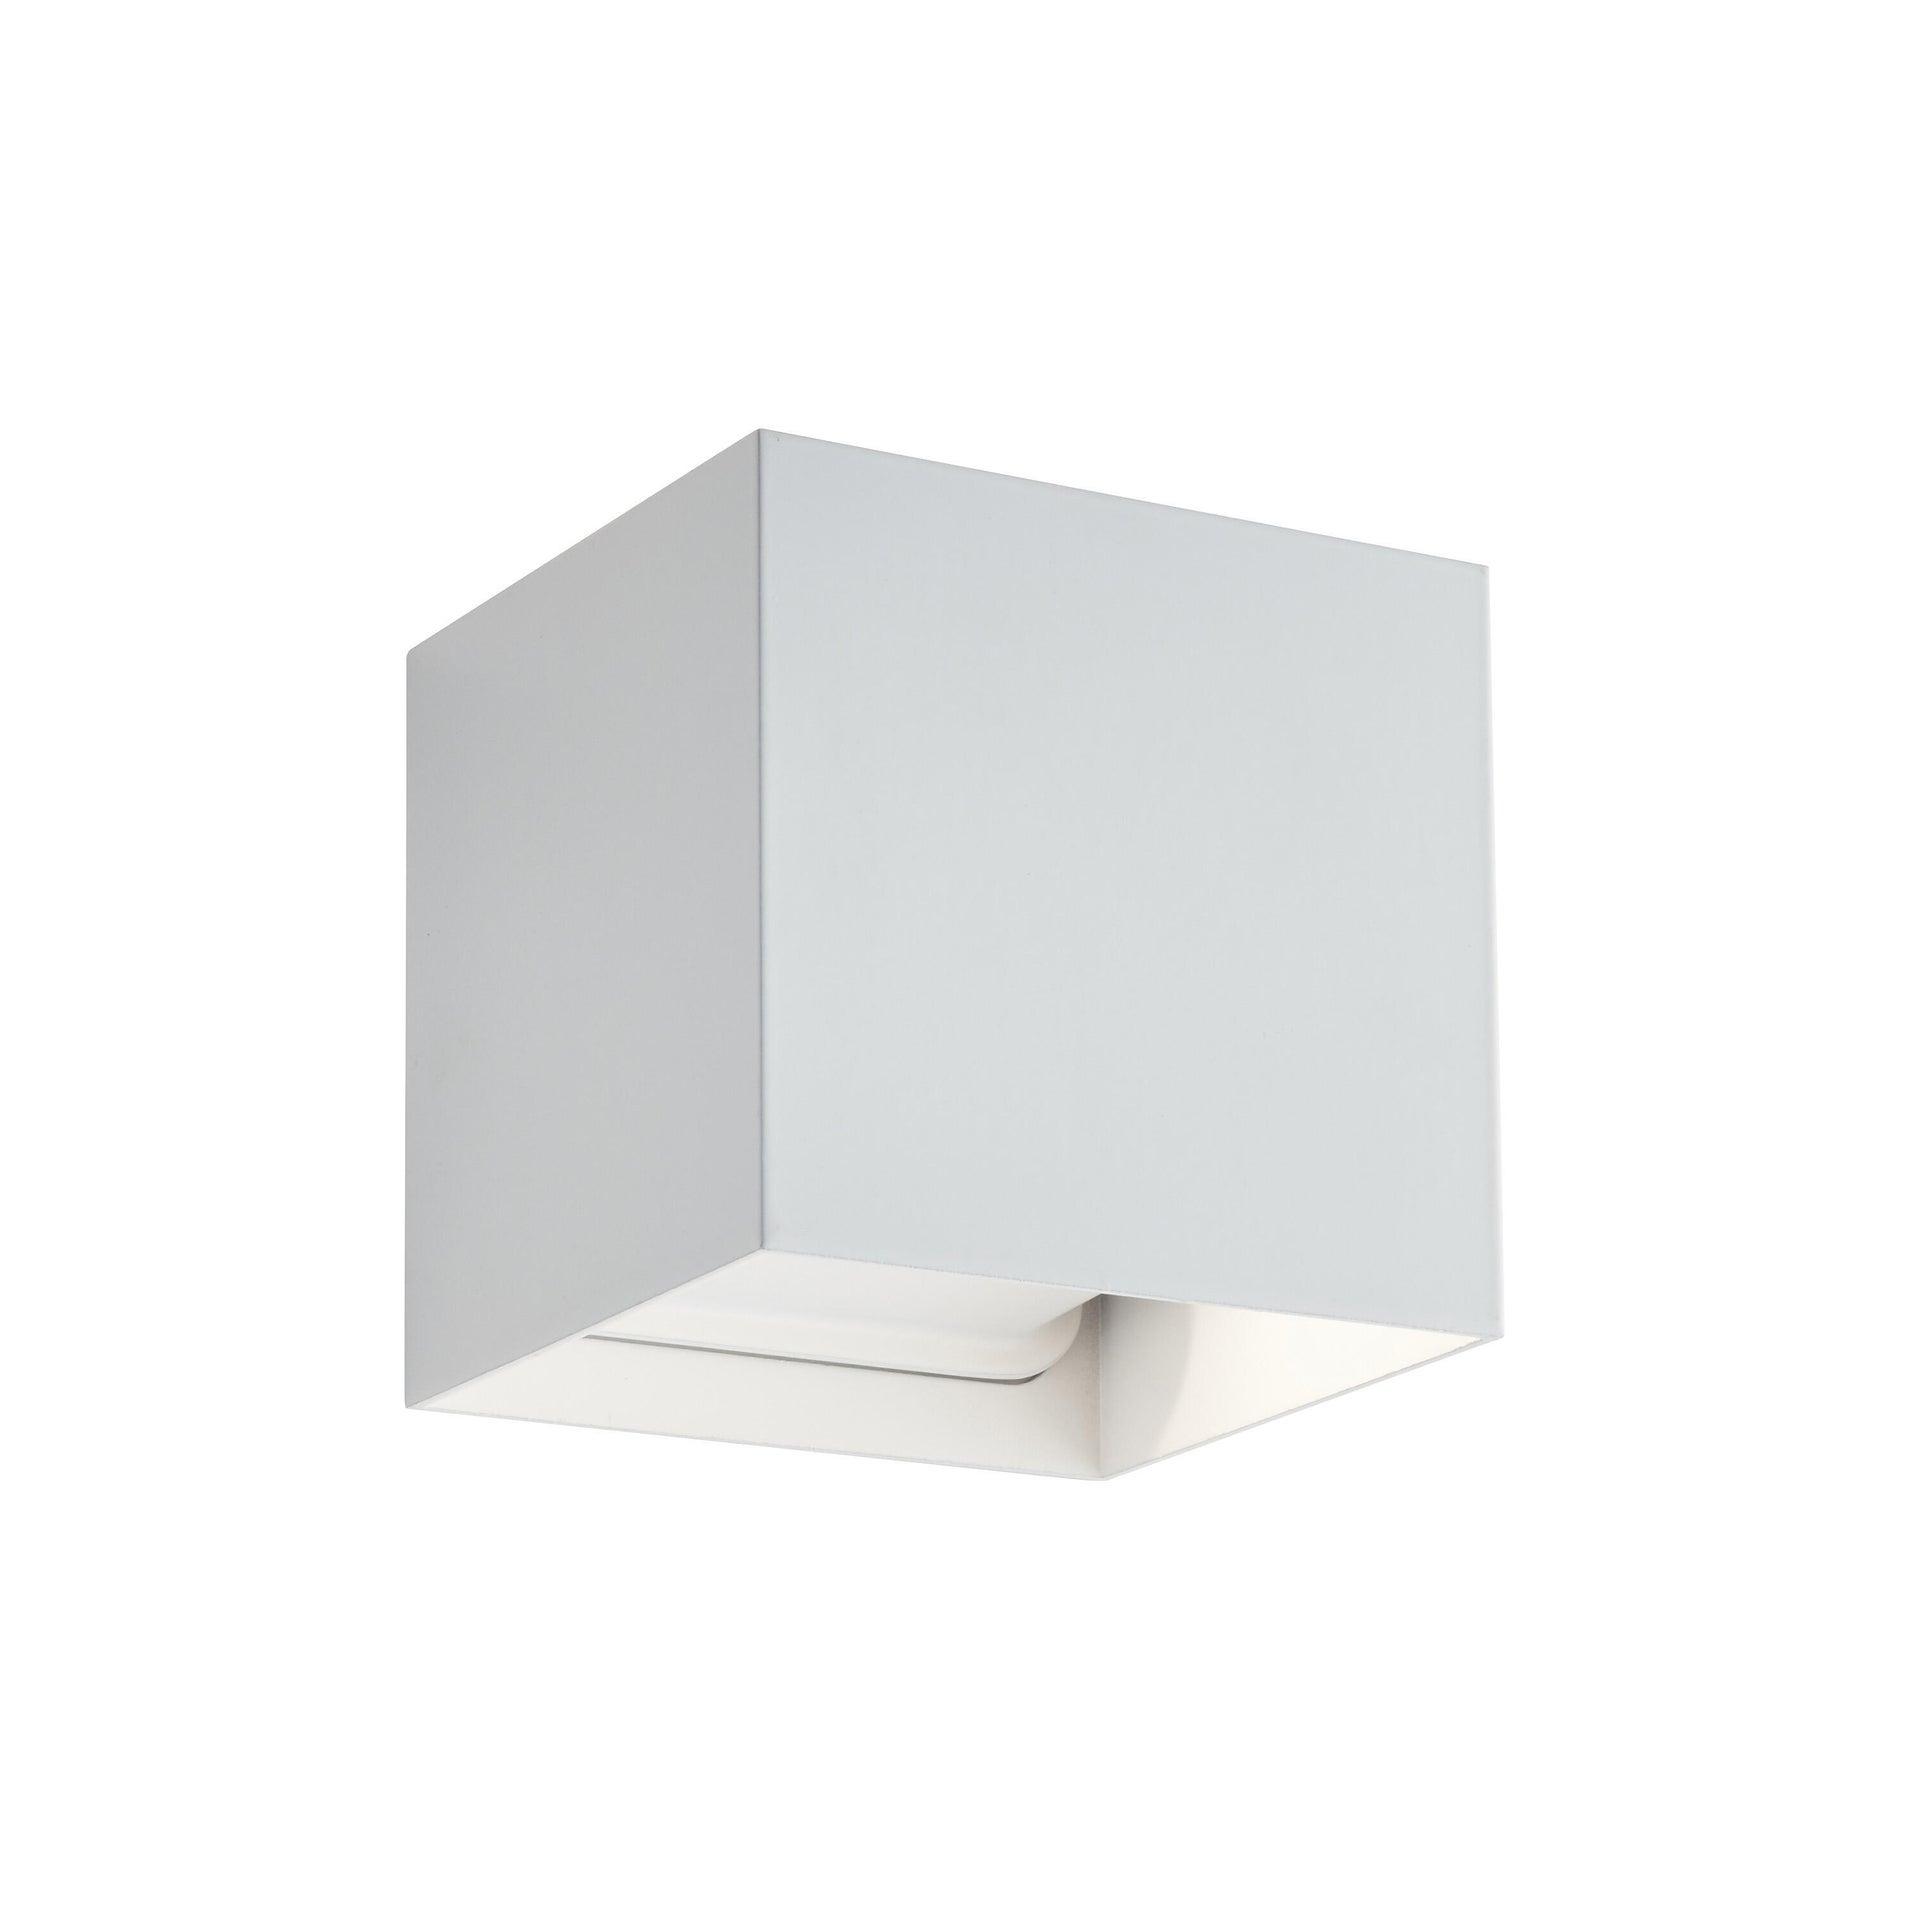 Applique design Kubbo LED integrato bianco, in alluminio, D. 10.0 cm 10.0x10.0 cm, INSPIRE - 7